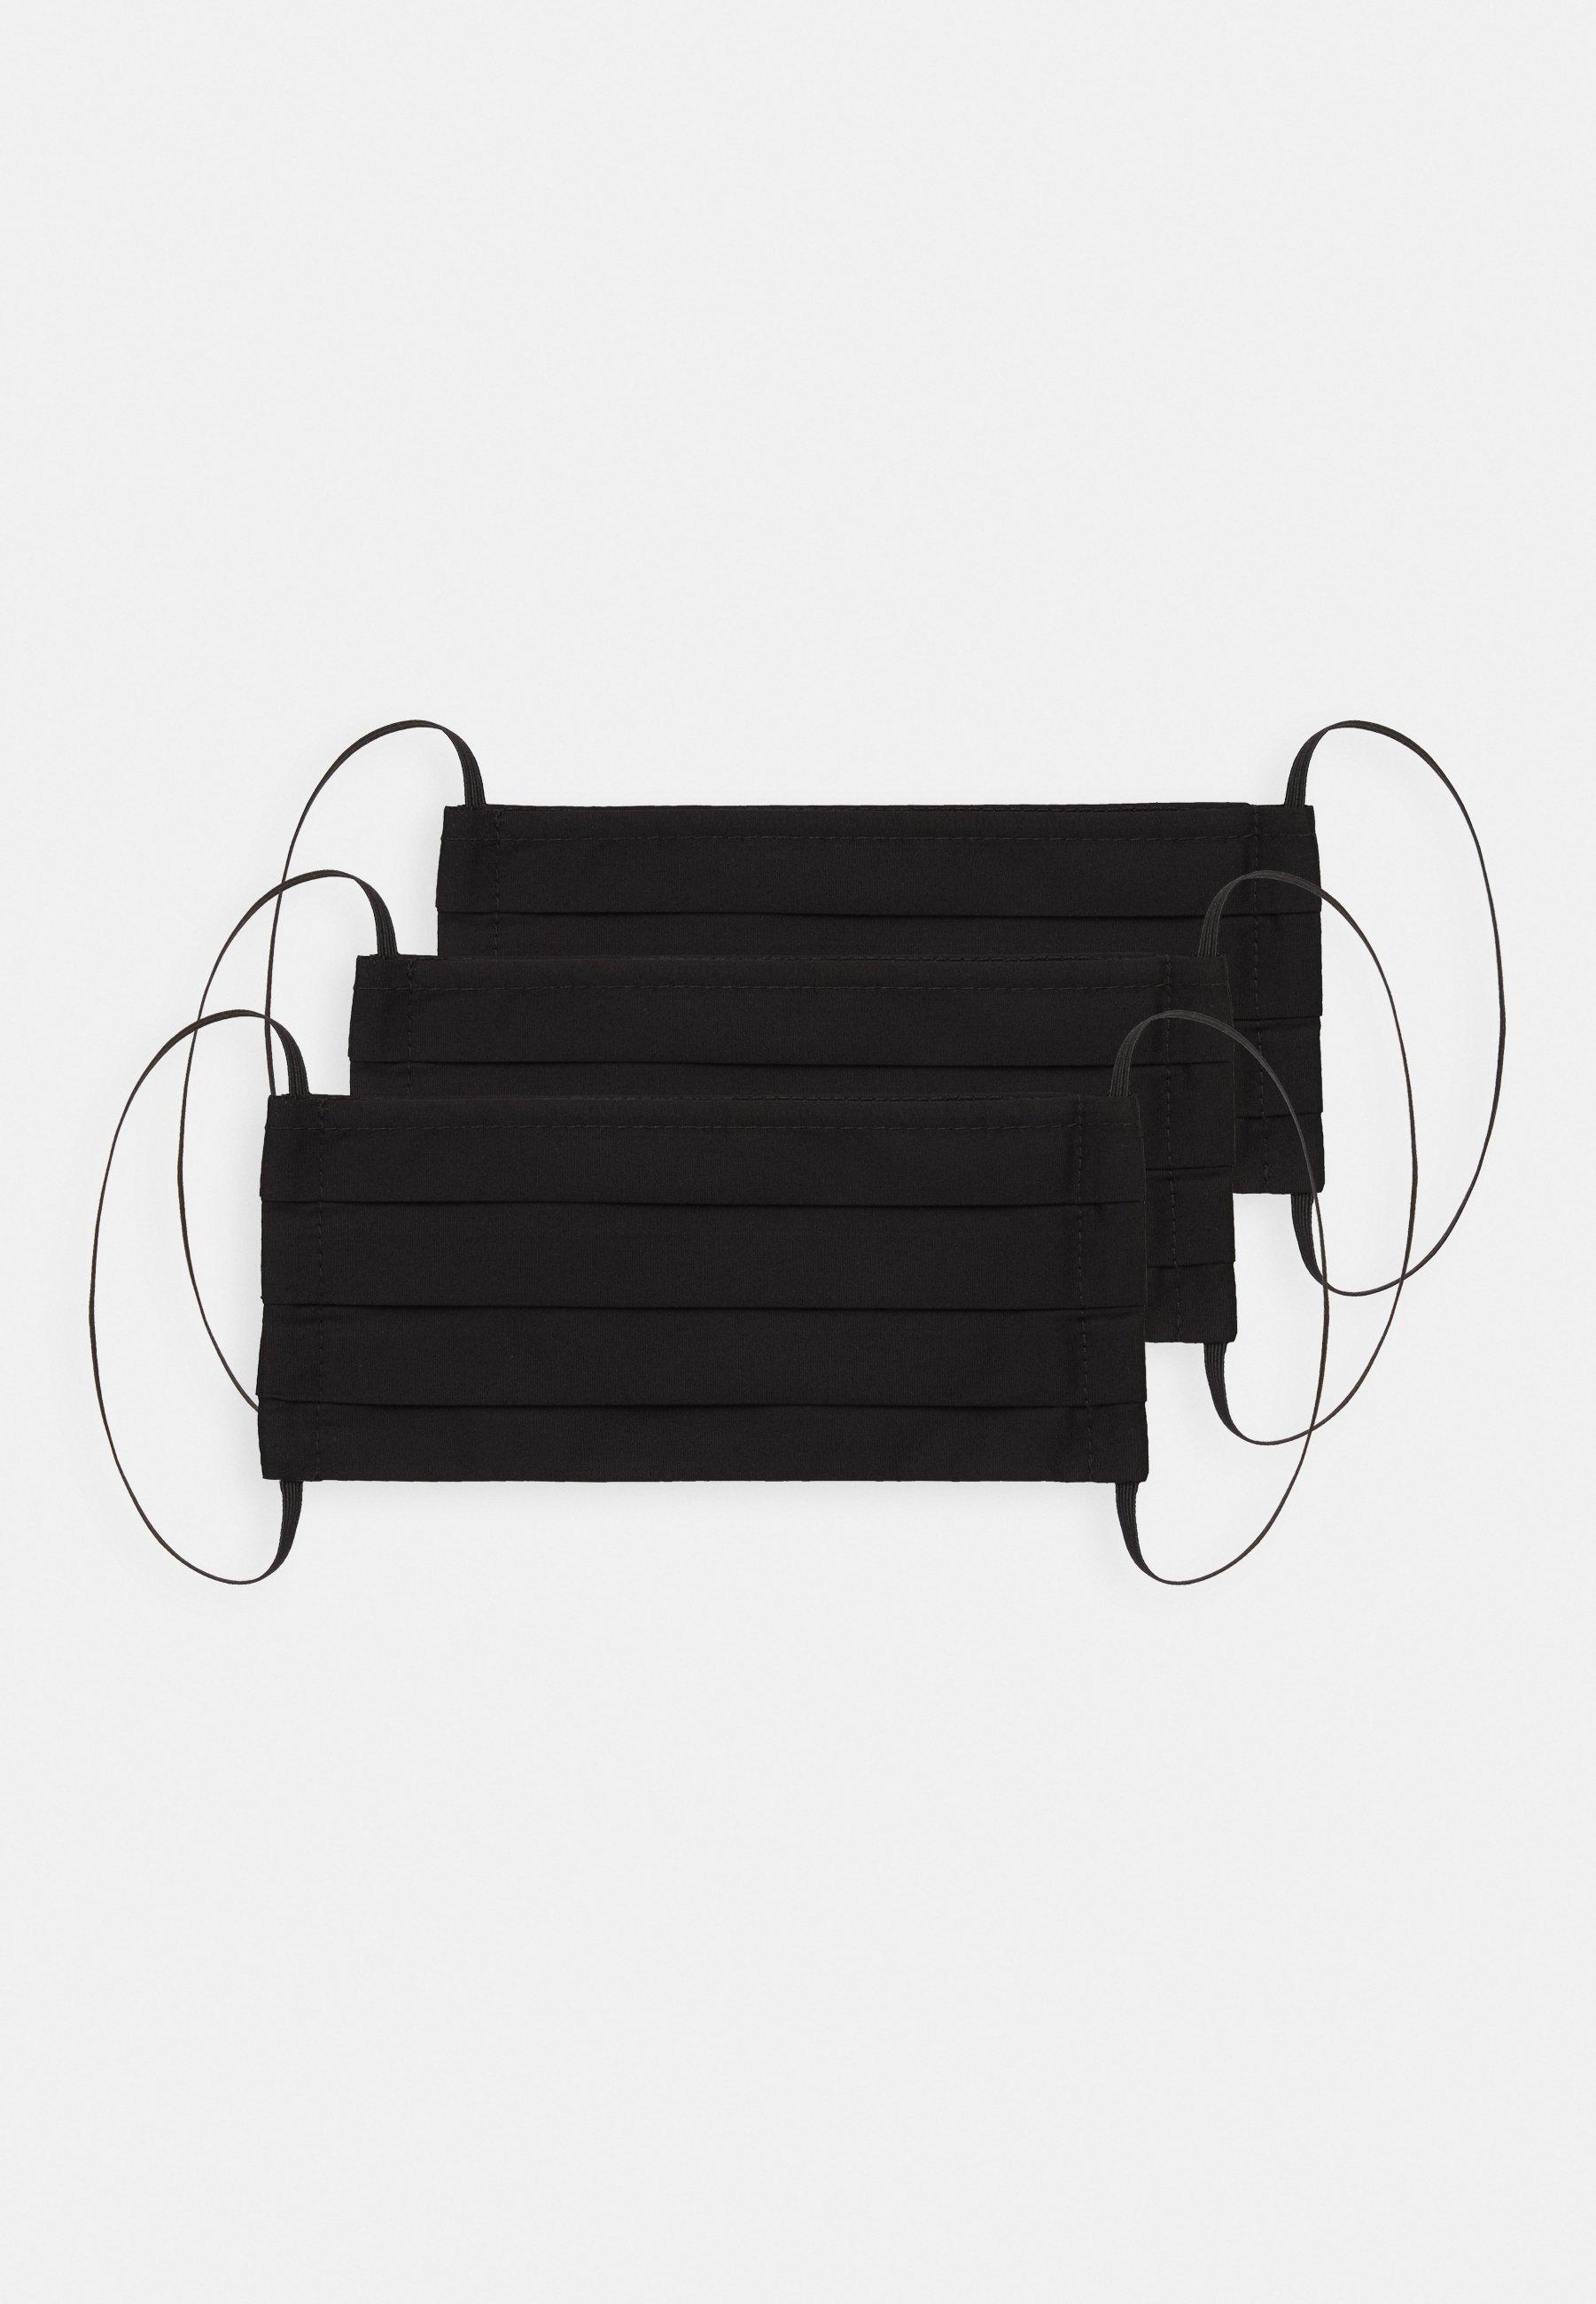 3 PACK - Stoffen mondkapje - Zwart